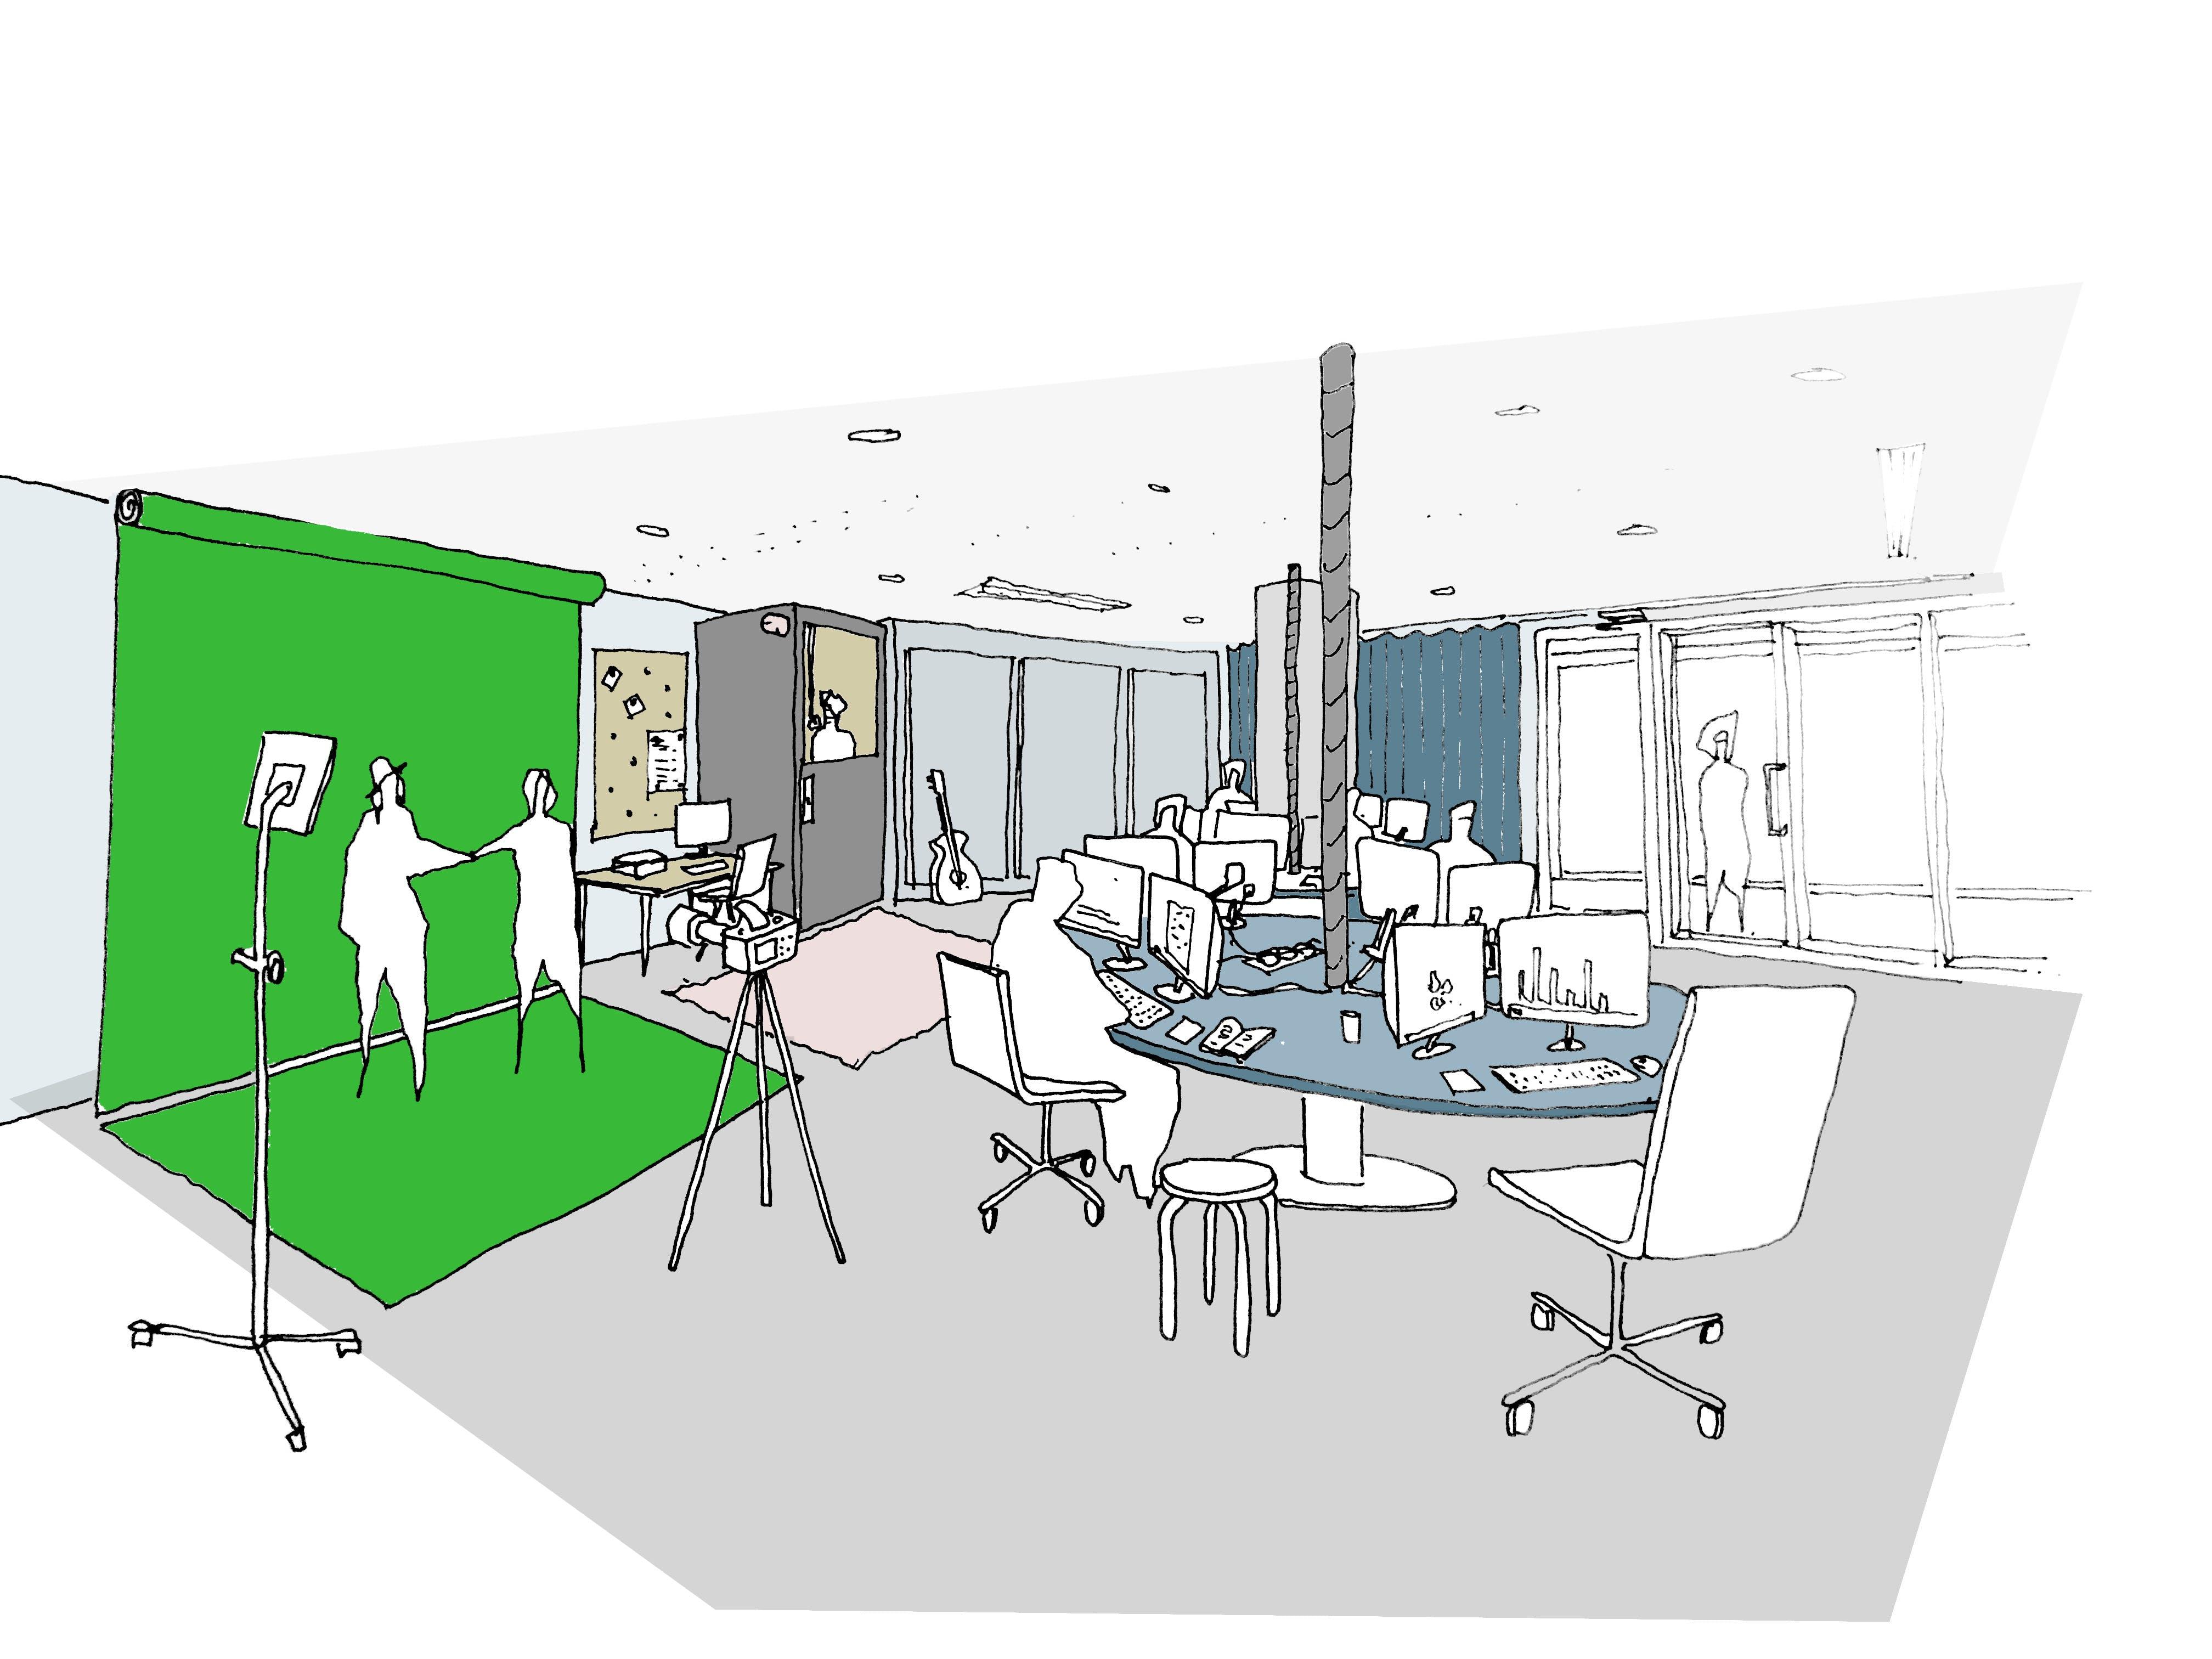 BVN_Sketch_Digital Studio (2).jpg